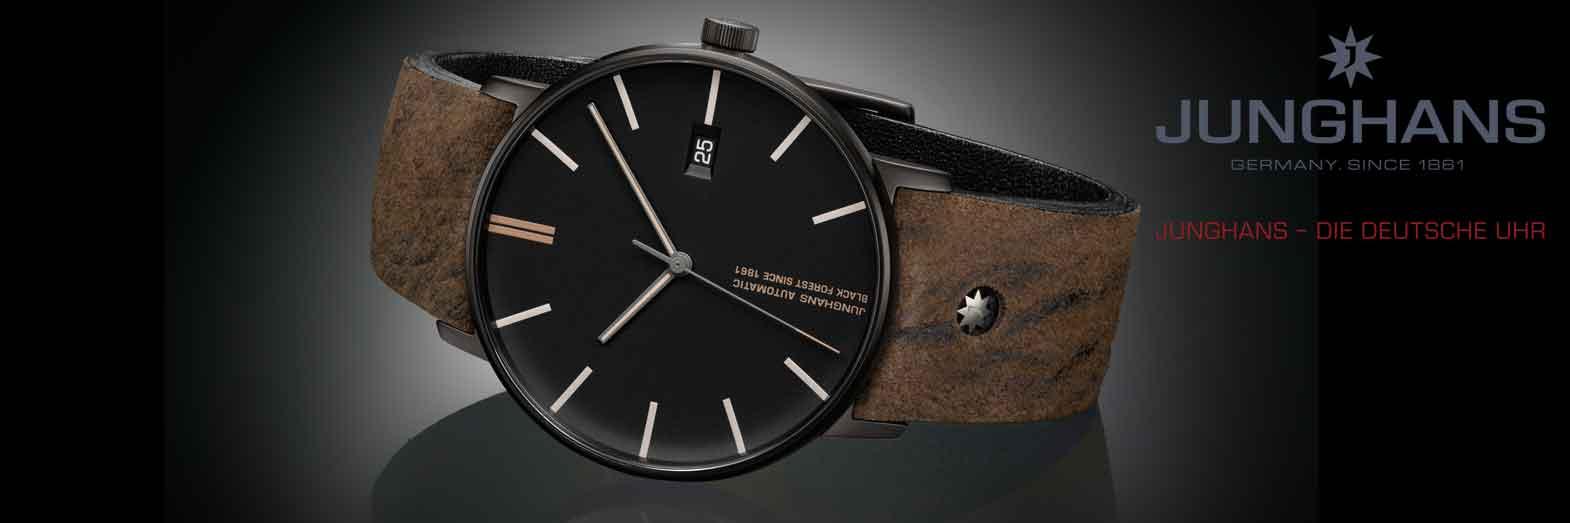 Junghans Form_A_Black_Forest_Sinde_1861_Limited_Edition